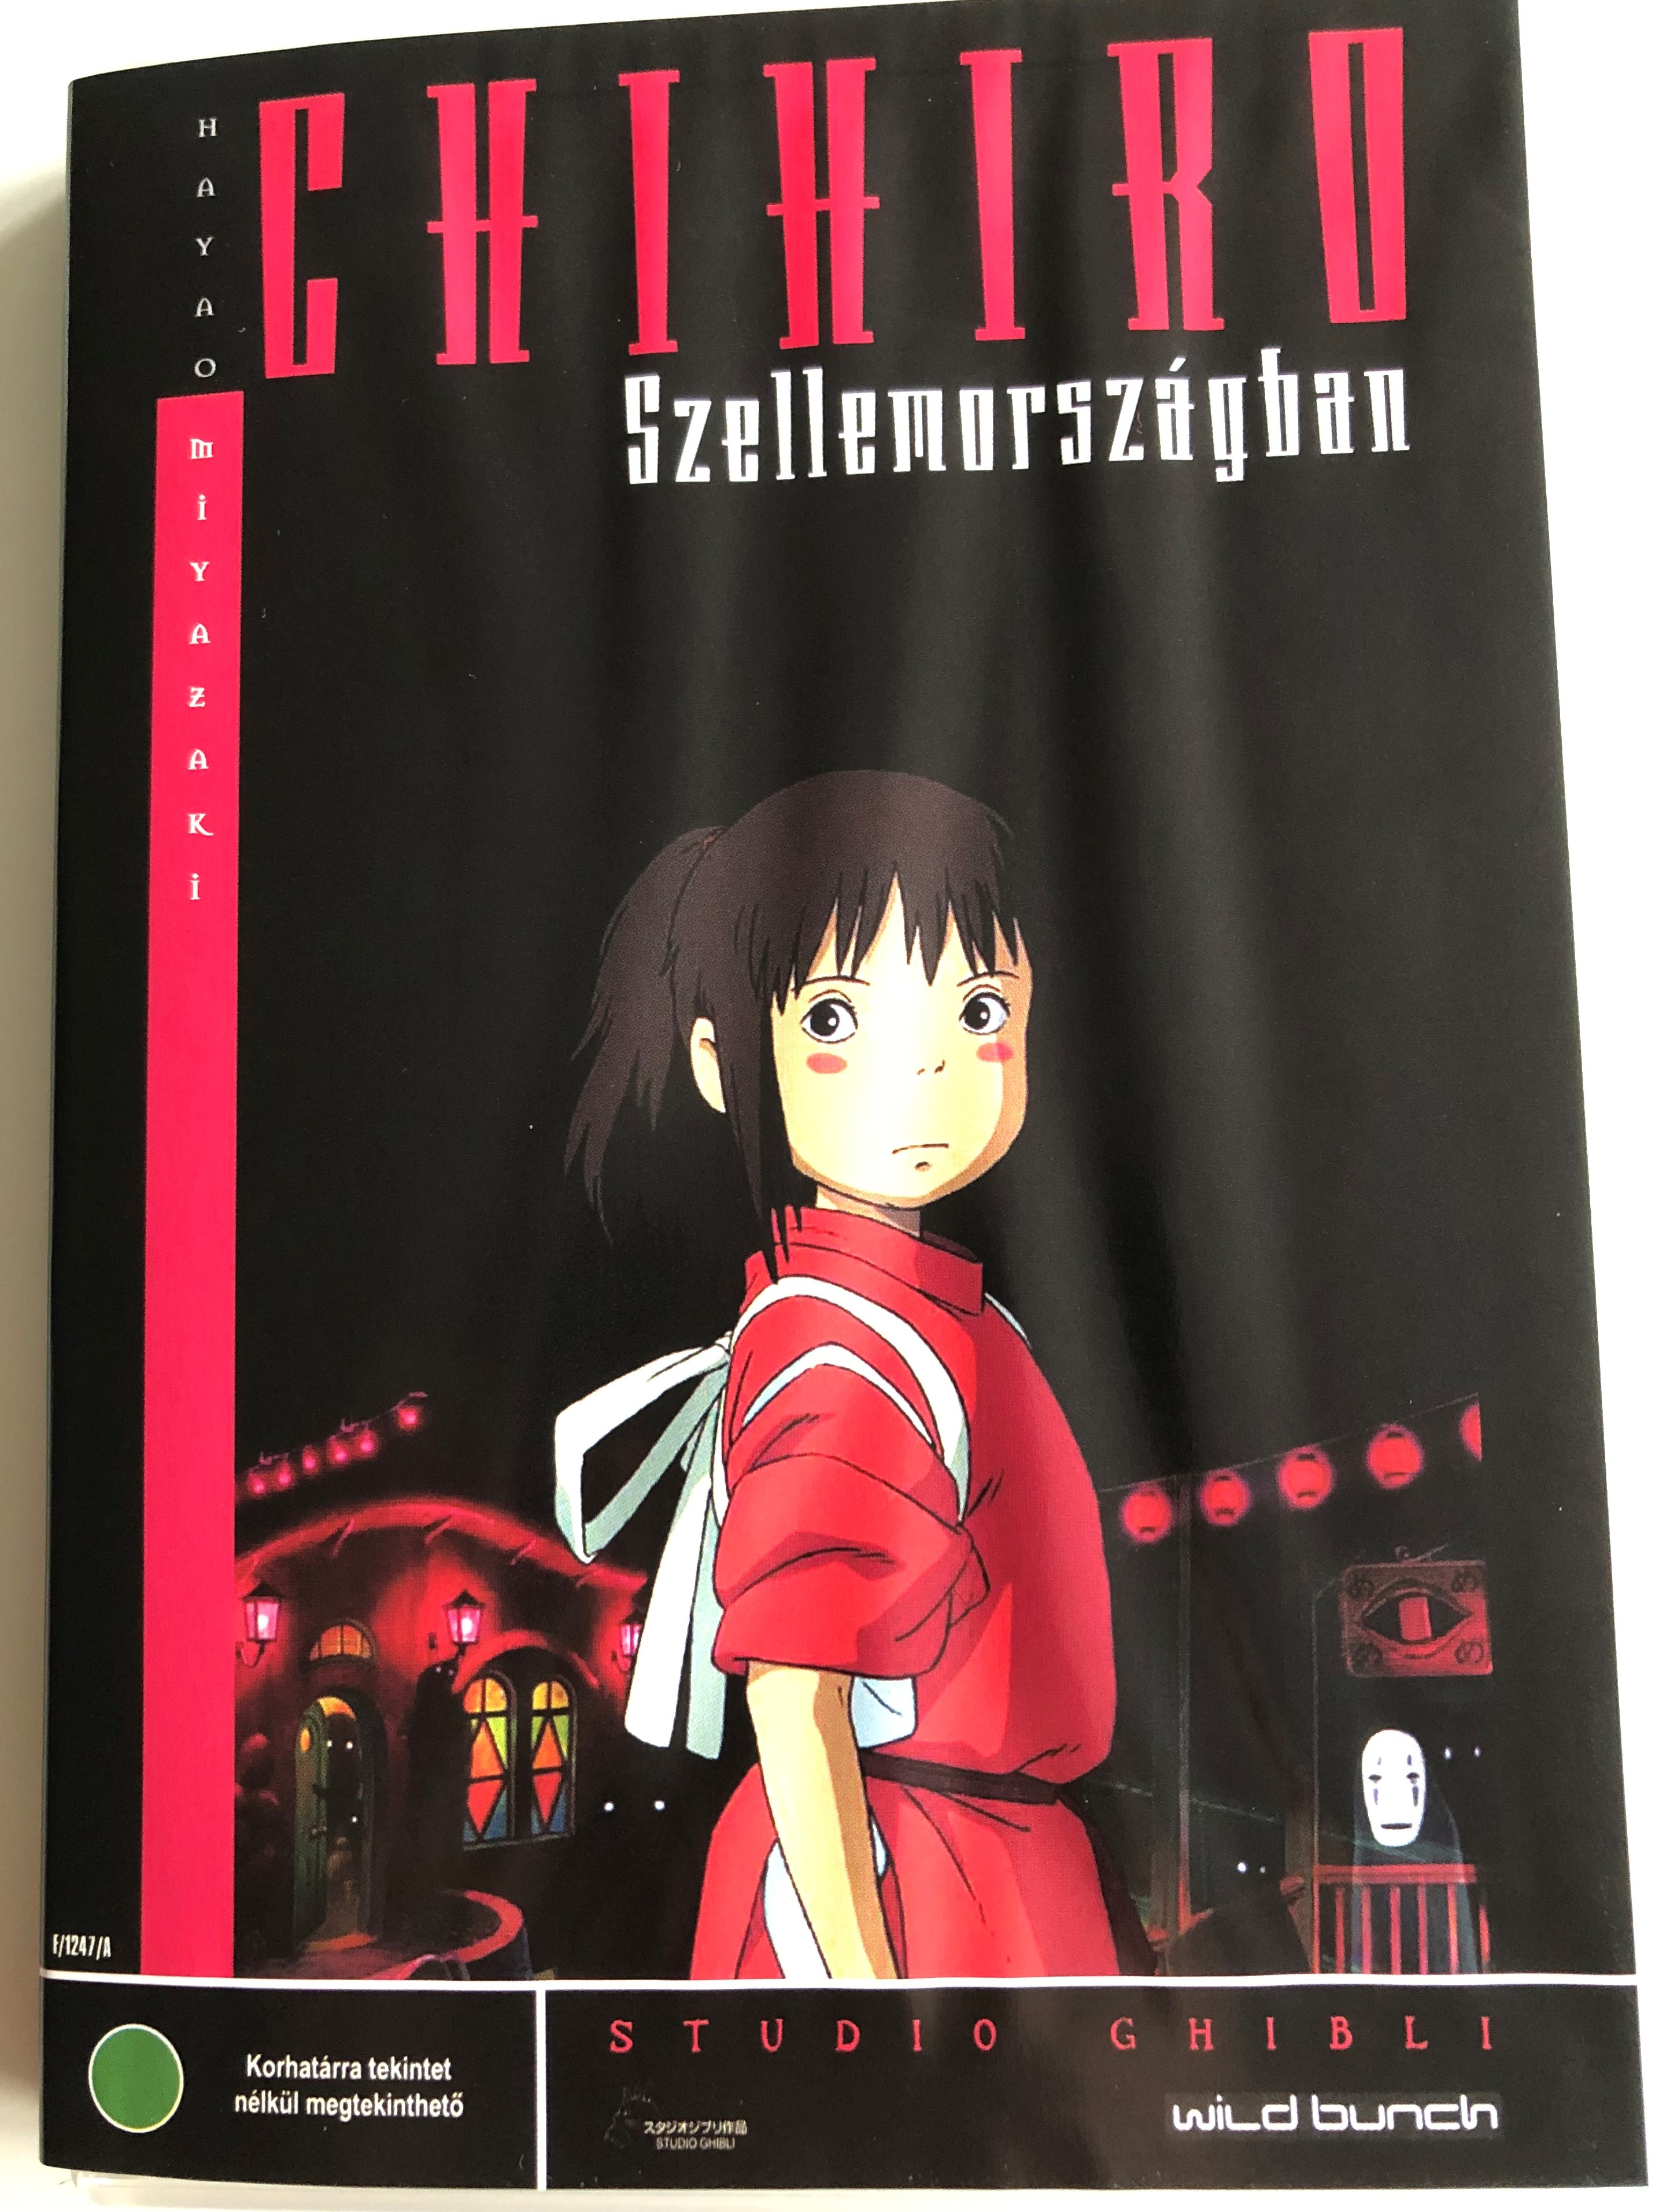 spirited-away-dvd-2001-chihiro-szellemorsz-gban-1.jpg